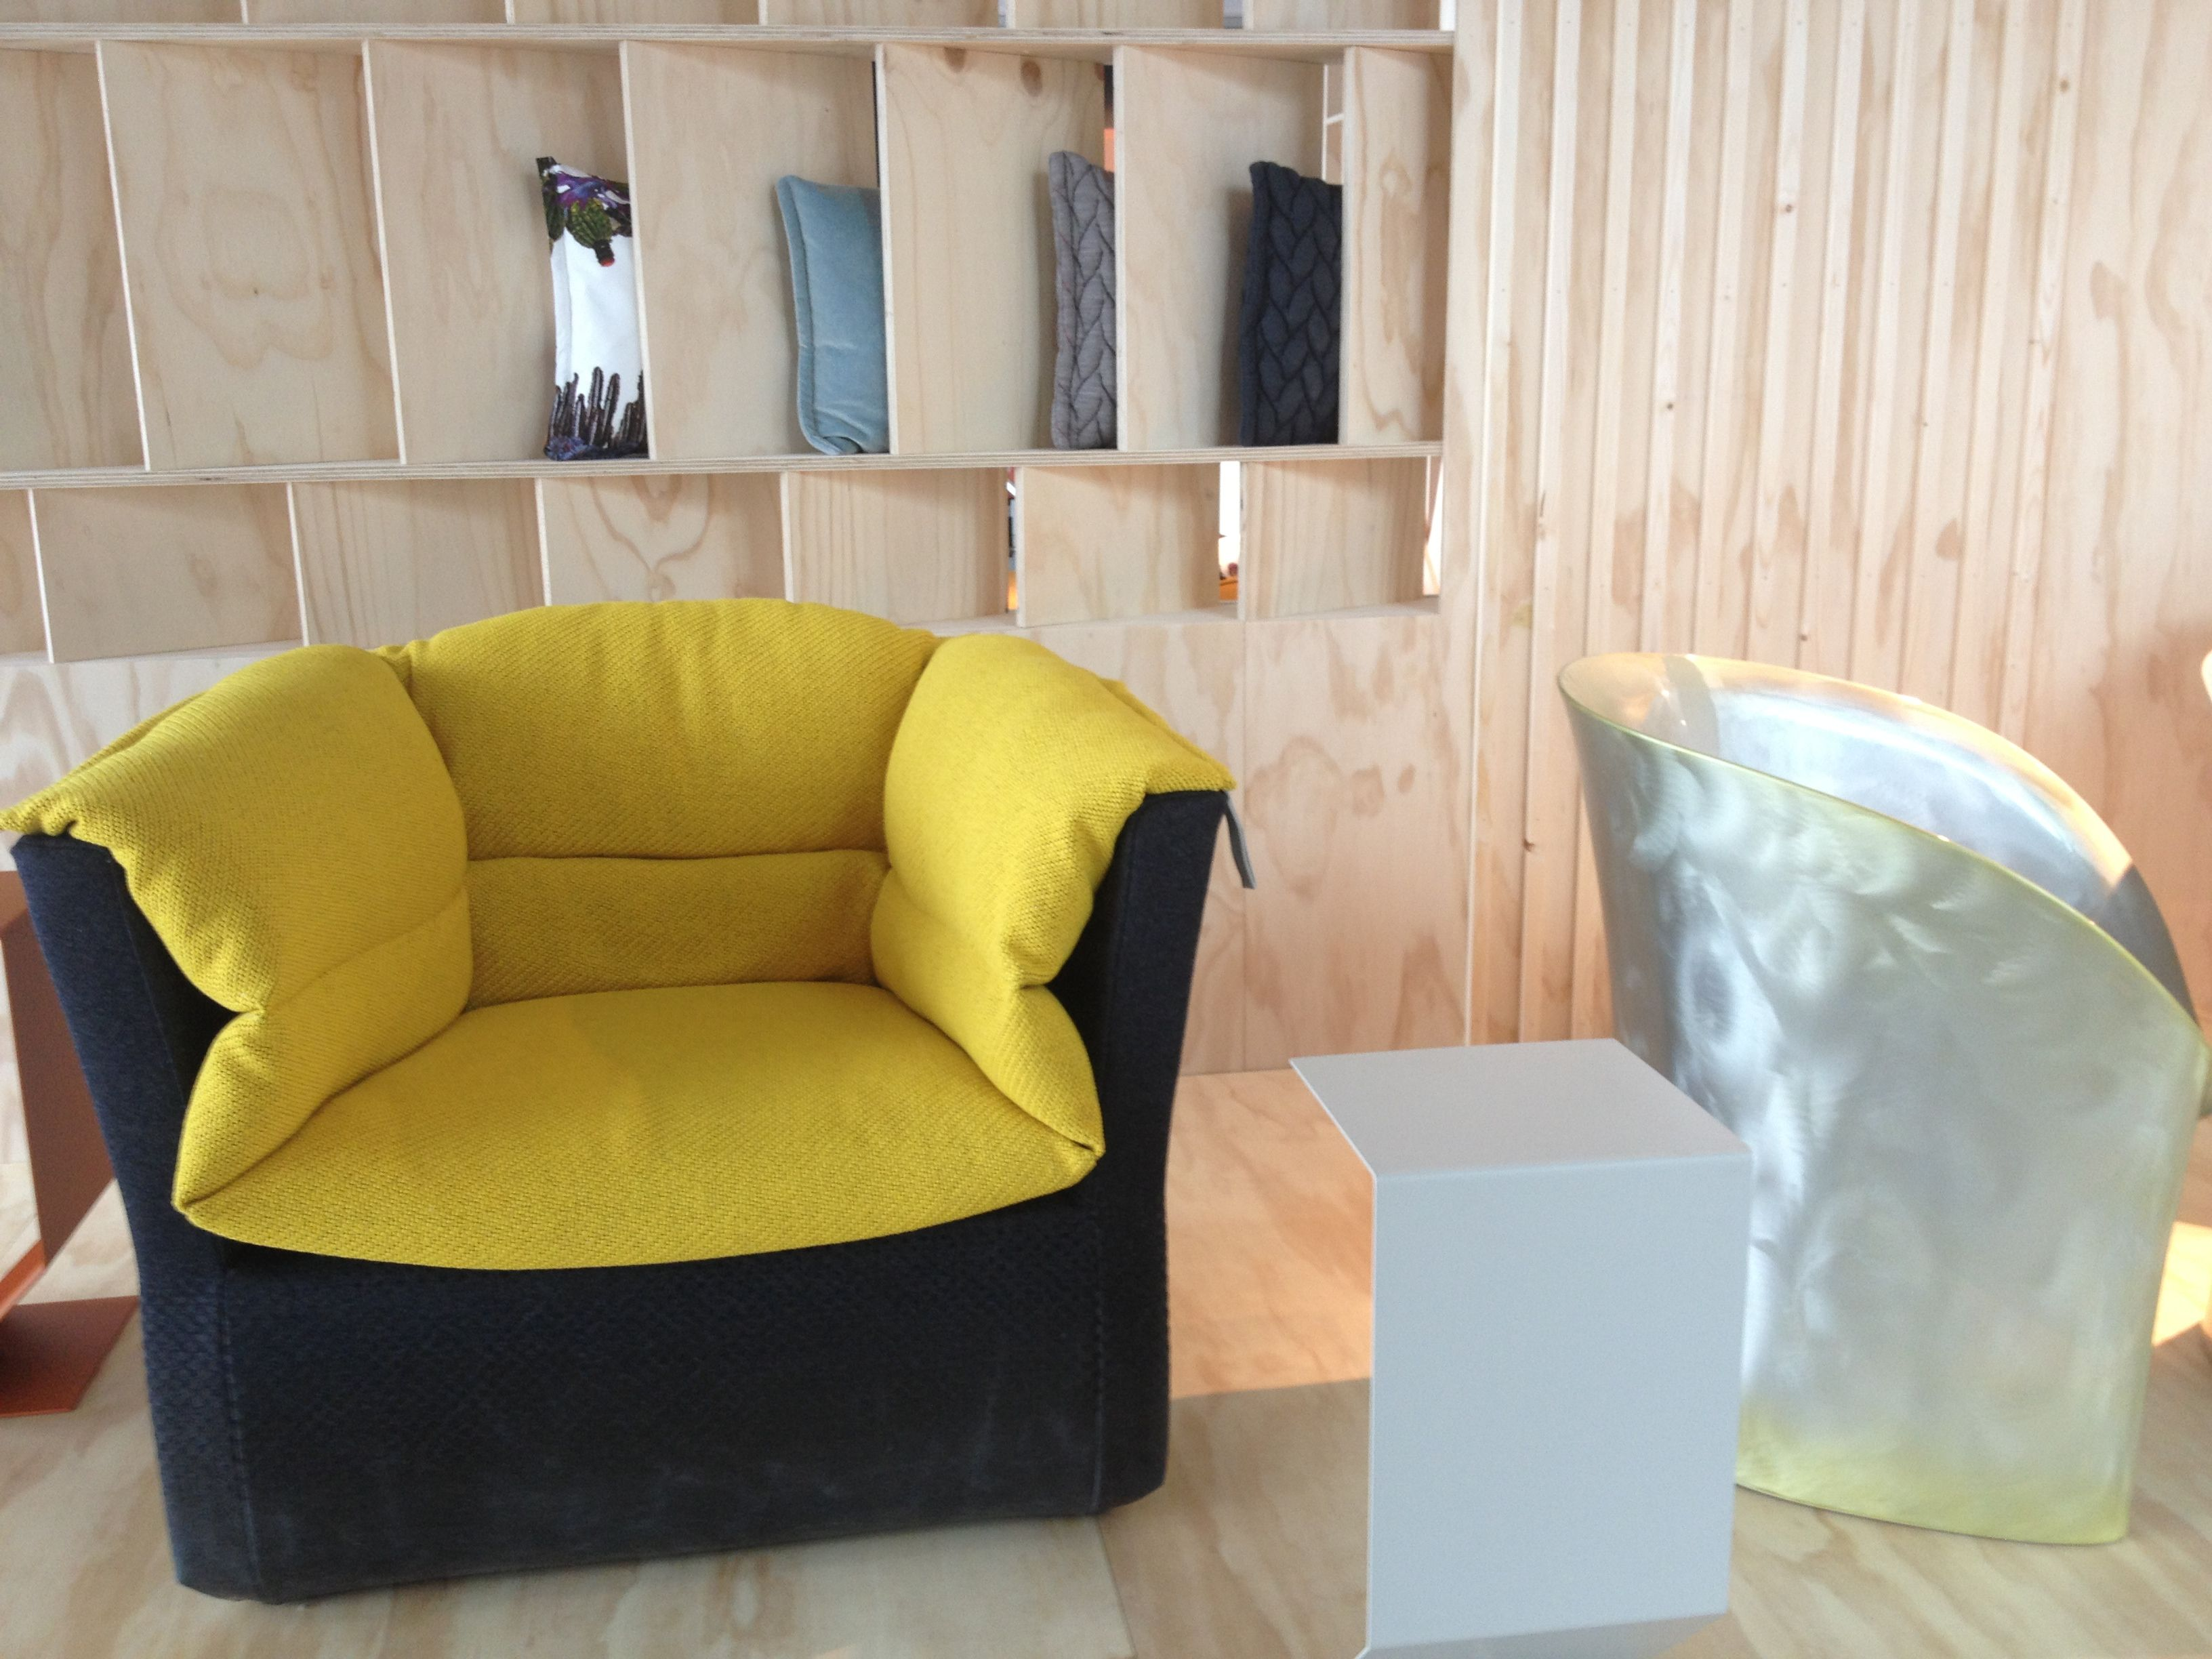 Moroso showroom Amsterdam Love me Tender bank en Clarissa stoel van Patricia Urquiola Moroso Nederland Pinterest